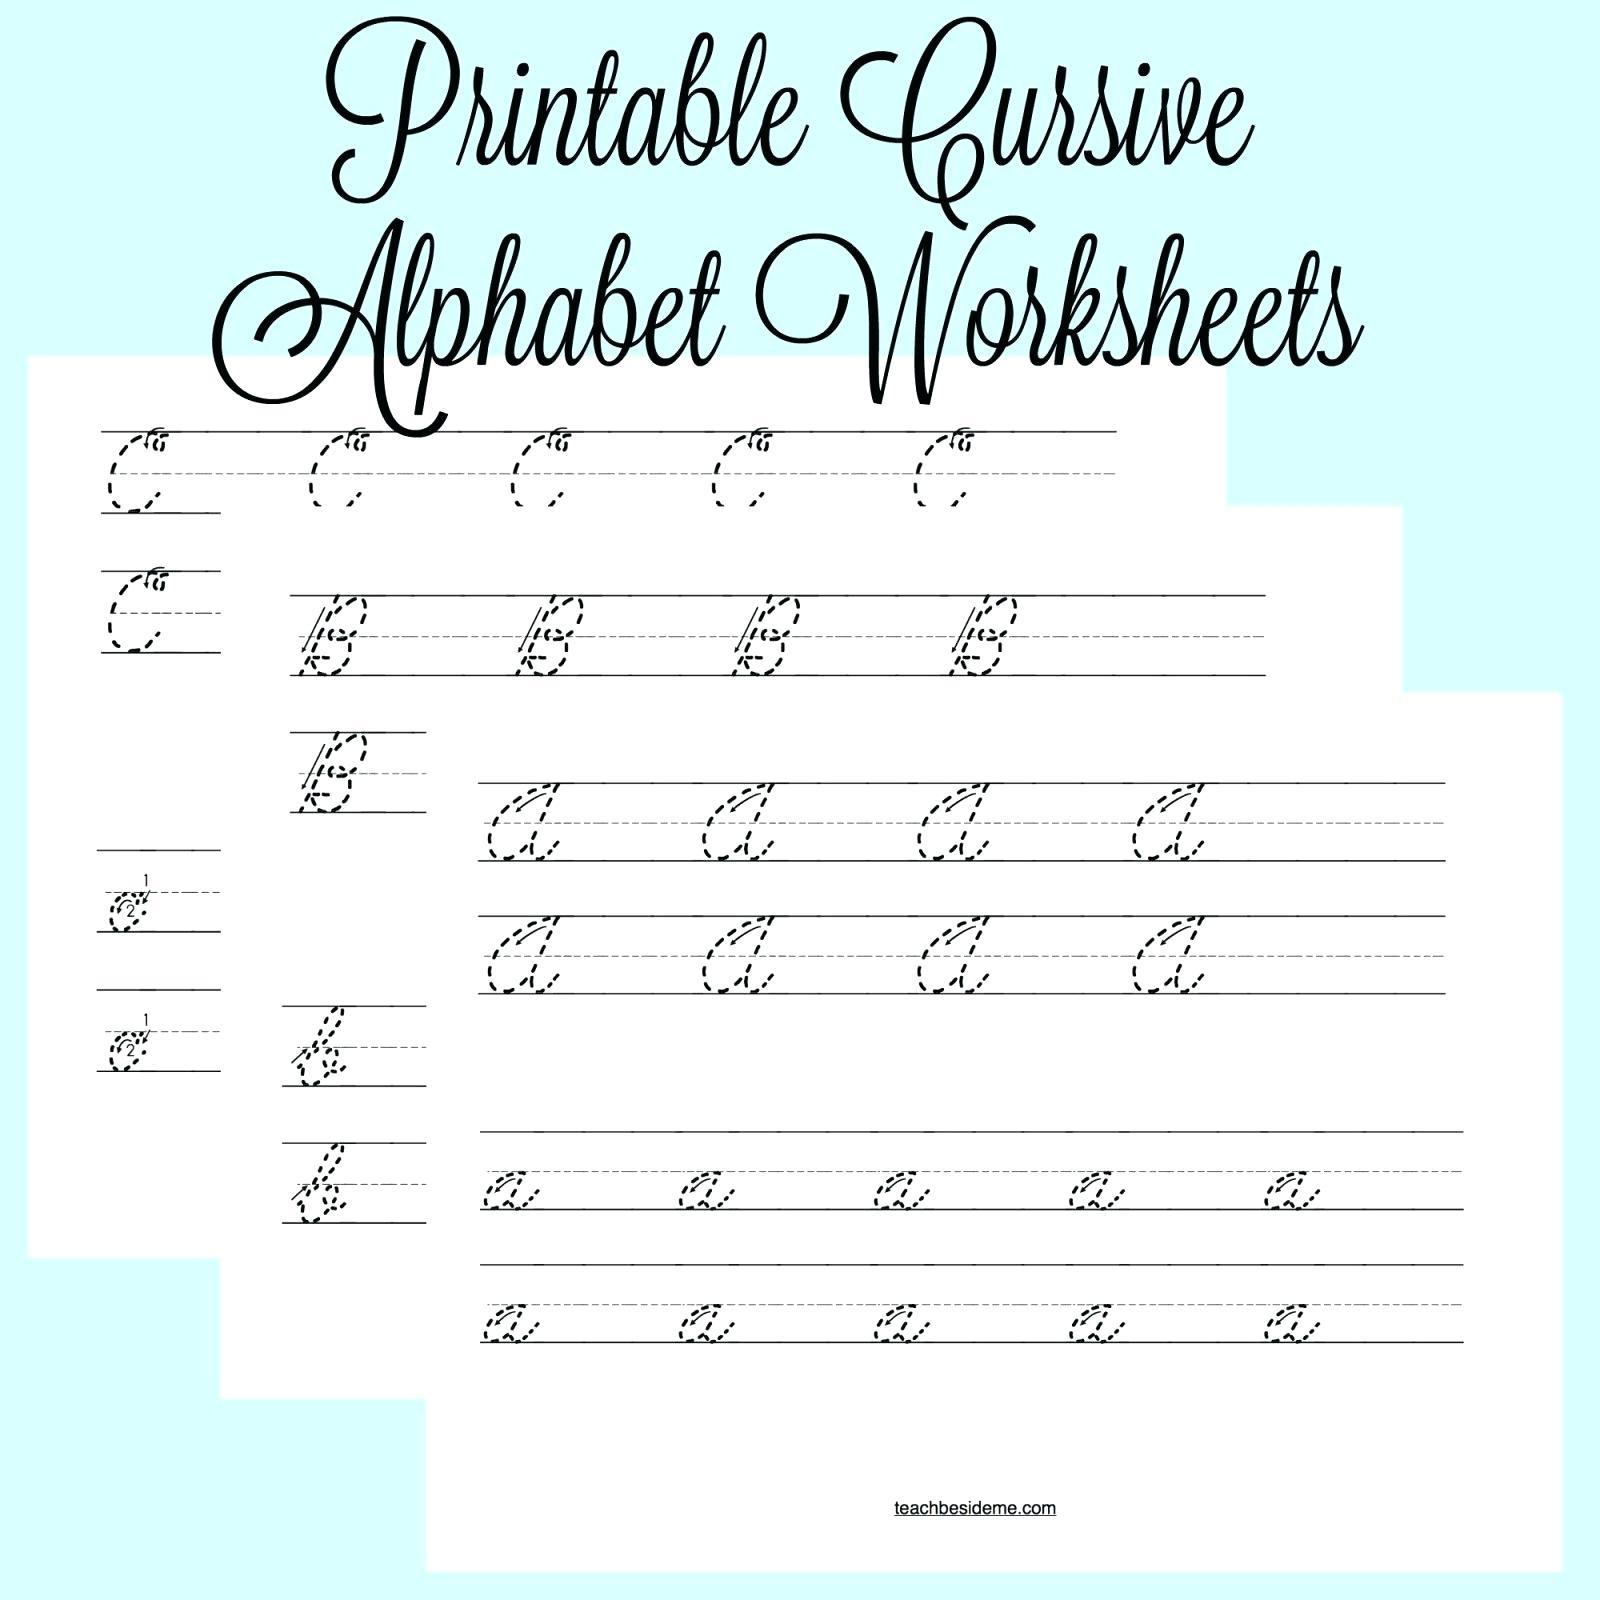 Cursive Writing Alphabets Worksheets – Shoppingfoorme.club | Cursive Writing Worksheets Printable Capital Letters